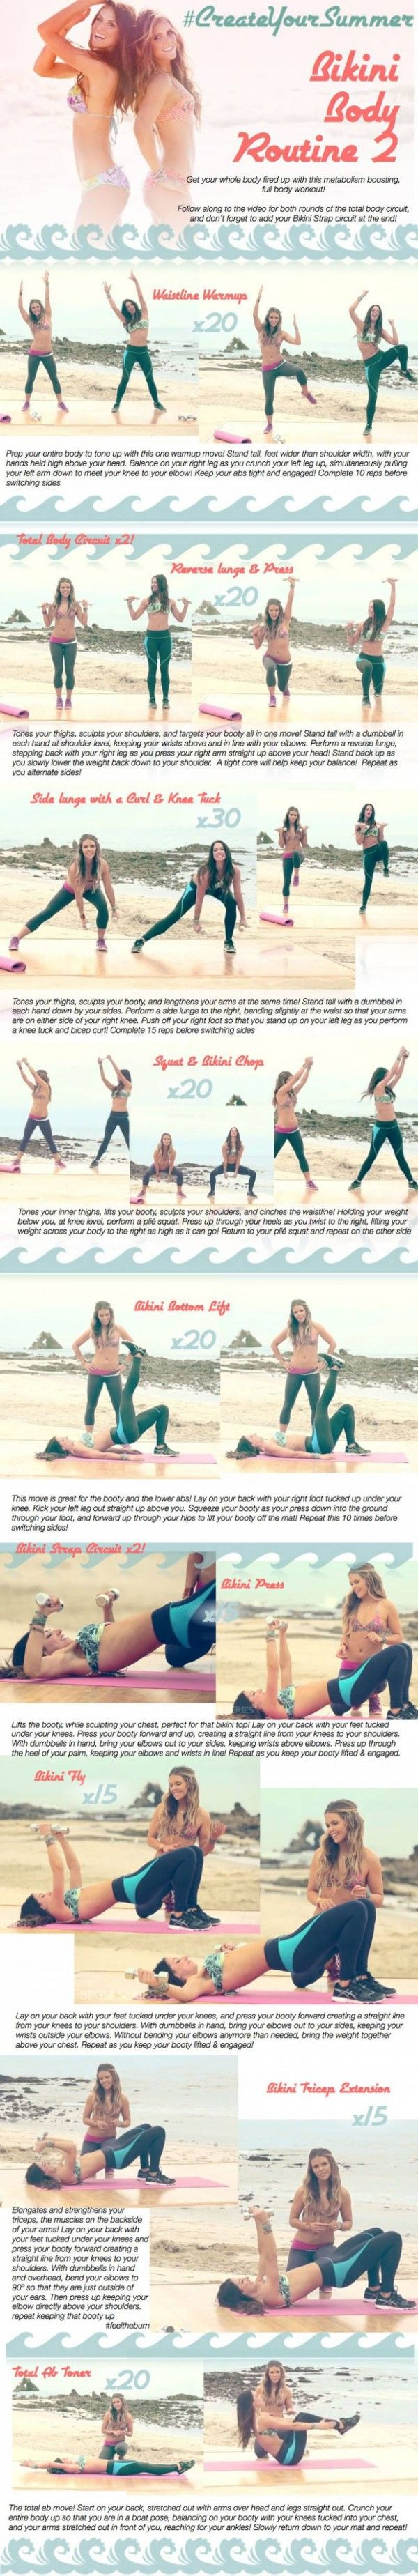 tone it up girls summer workout